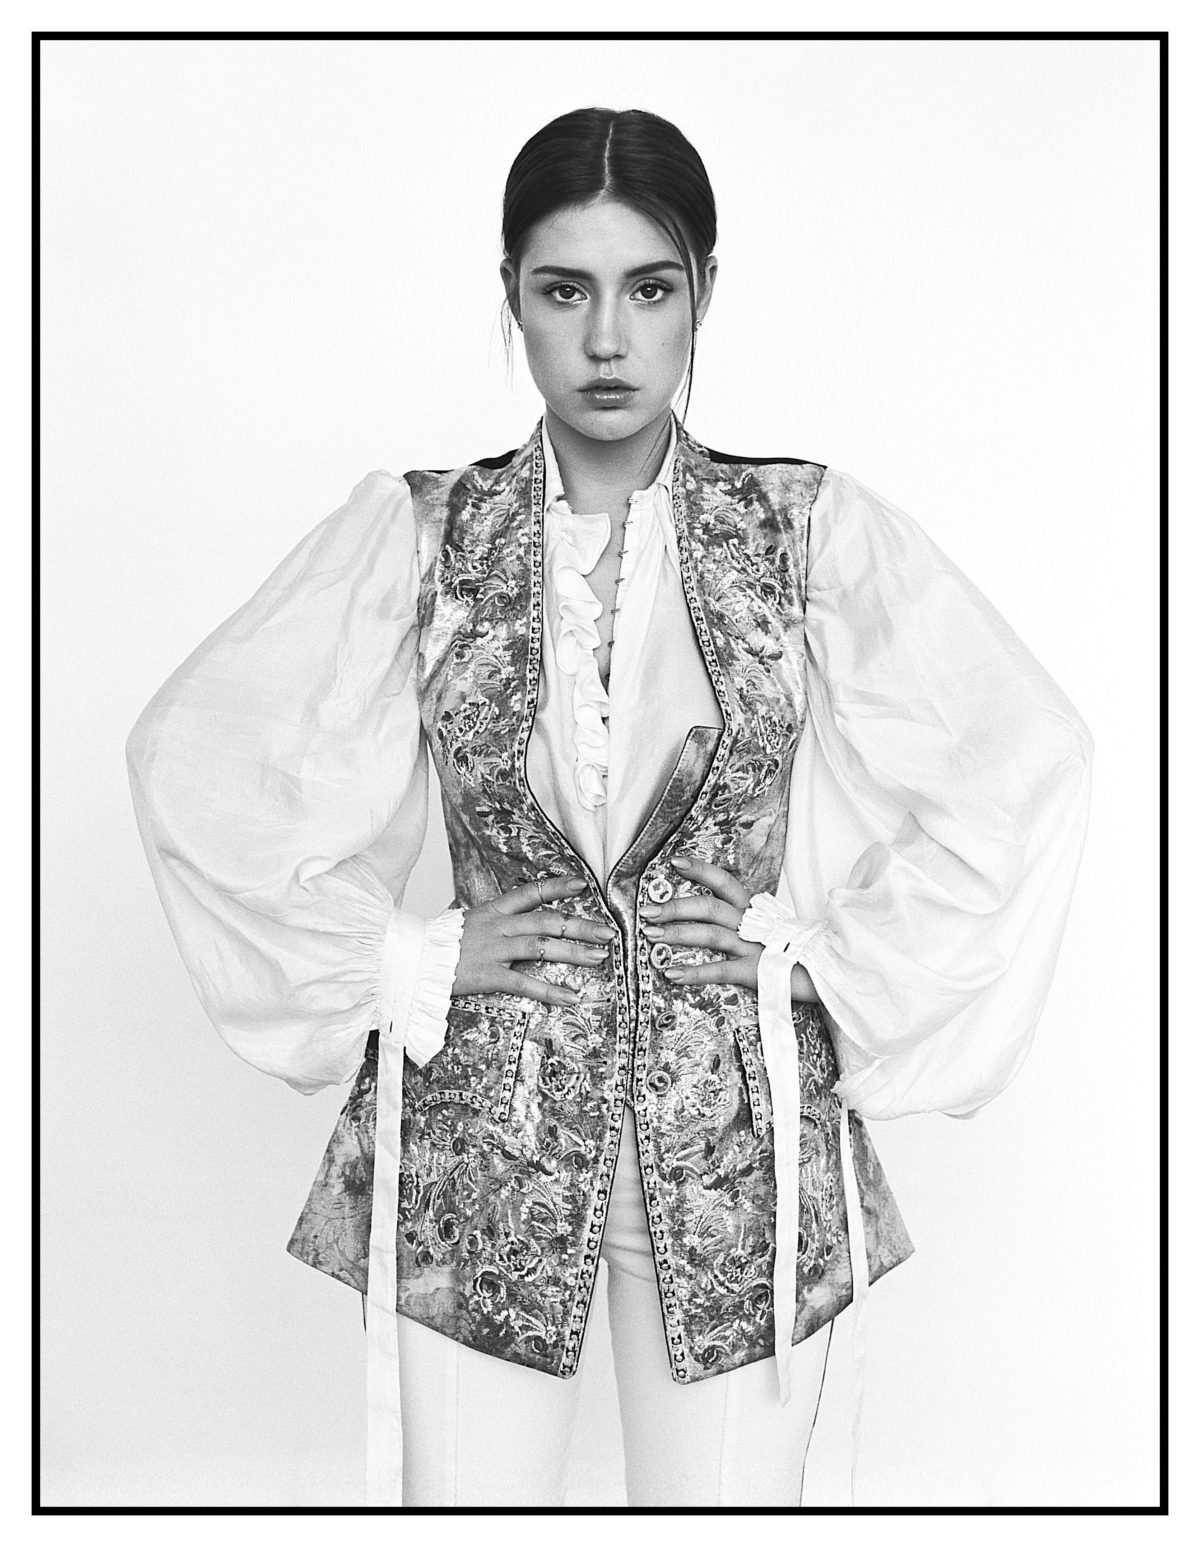 Adele Exarchopoulos (c) Stéphanie Volpato - style Arthur Mayadoux - Harper's Bazaar Brazil